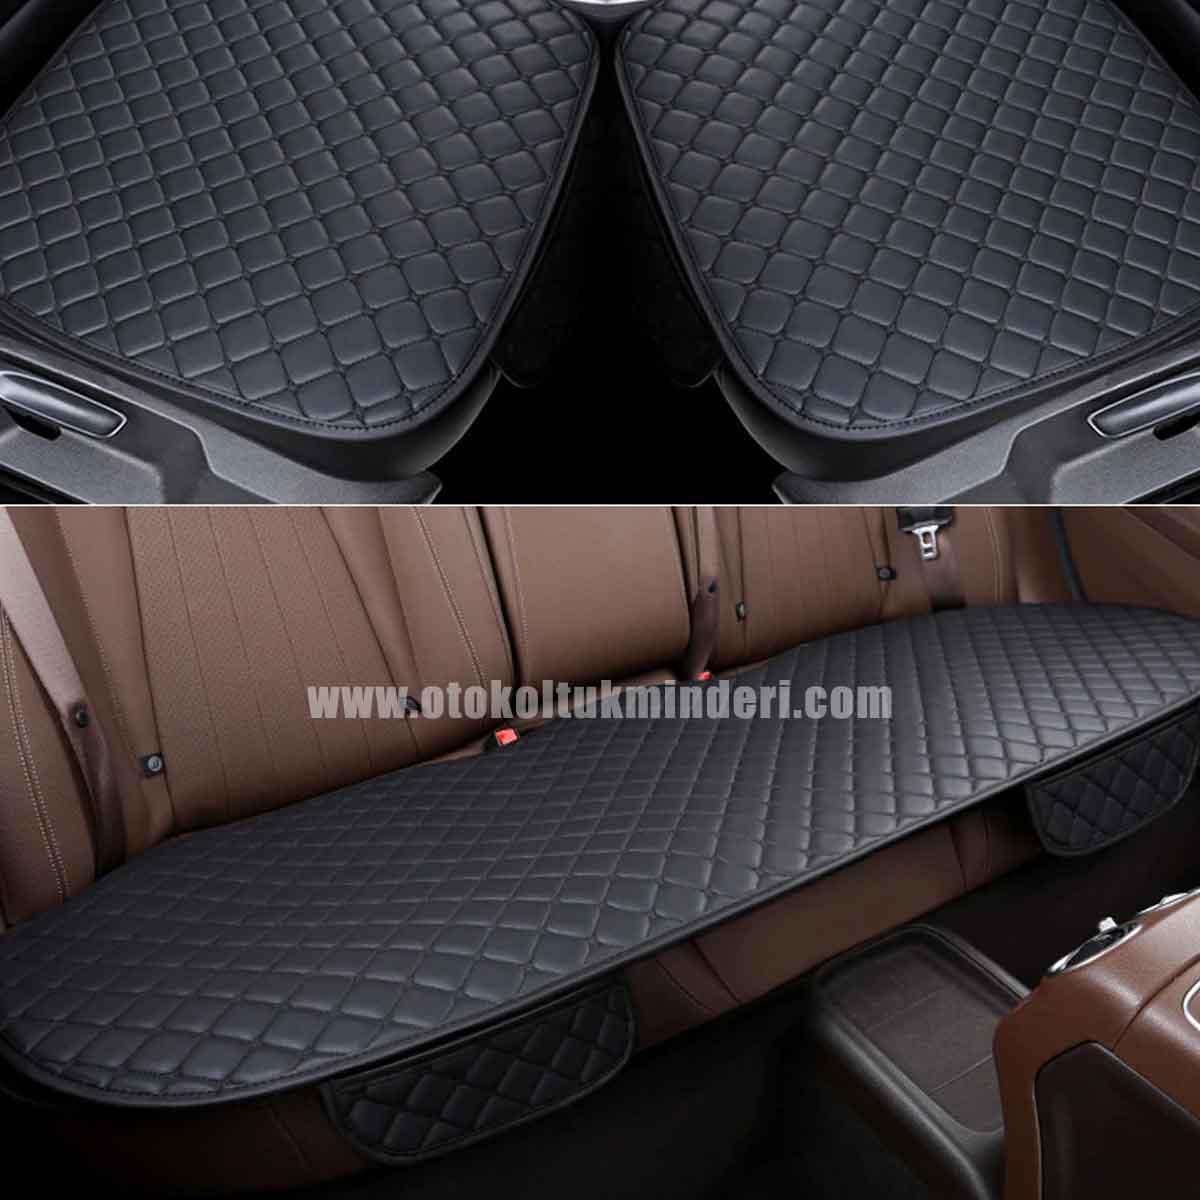 Mercedes koltuk kılıfı deri 1 - Mercedes Koltuk minderi Siyah Deri Cepli